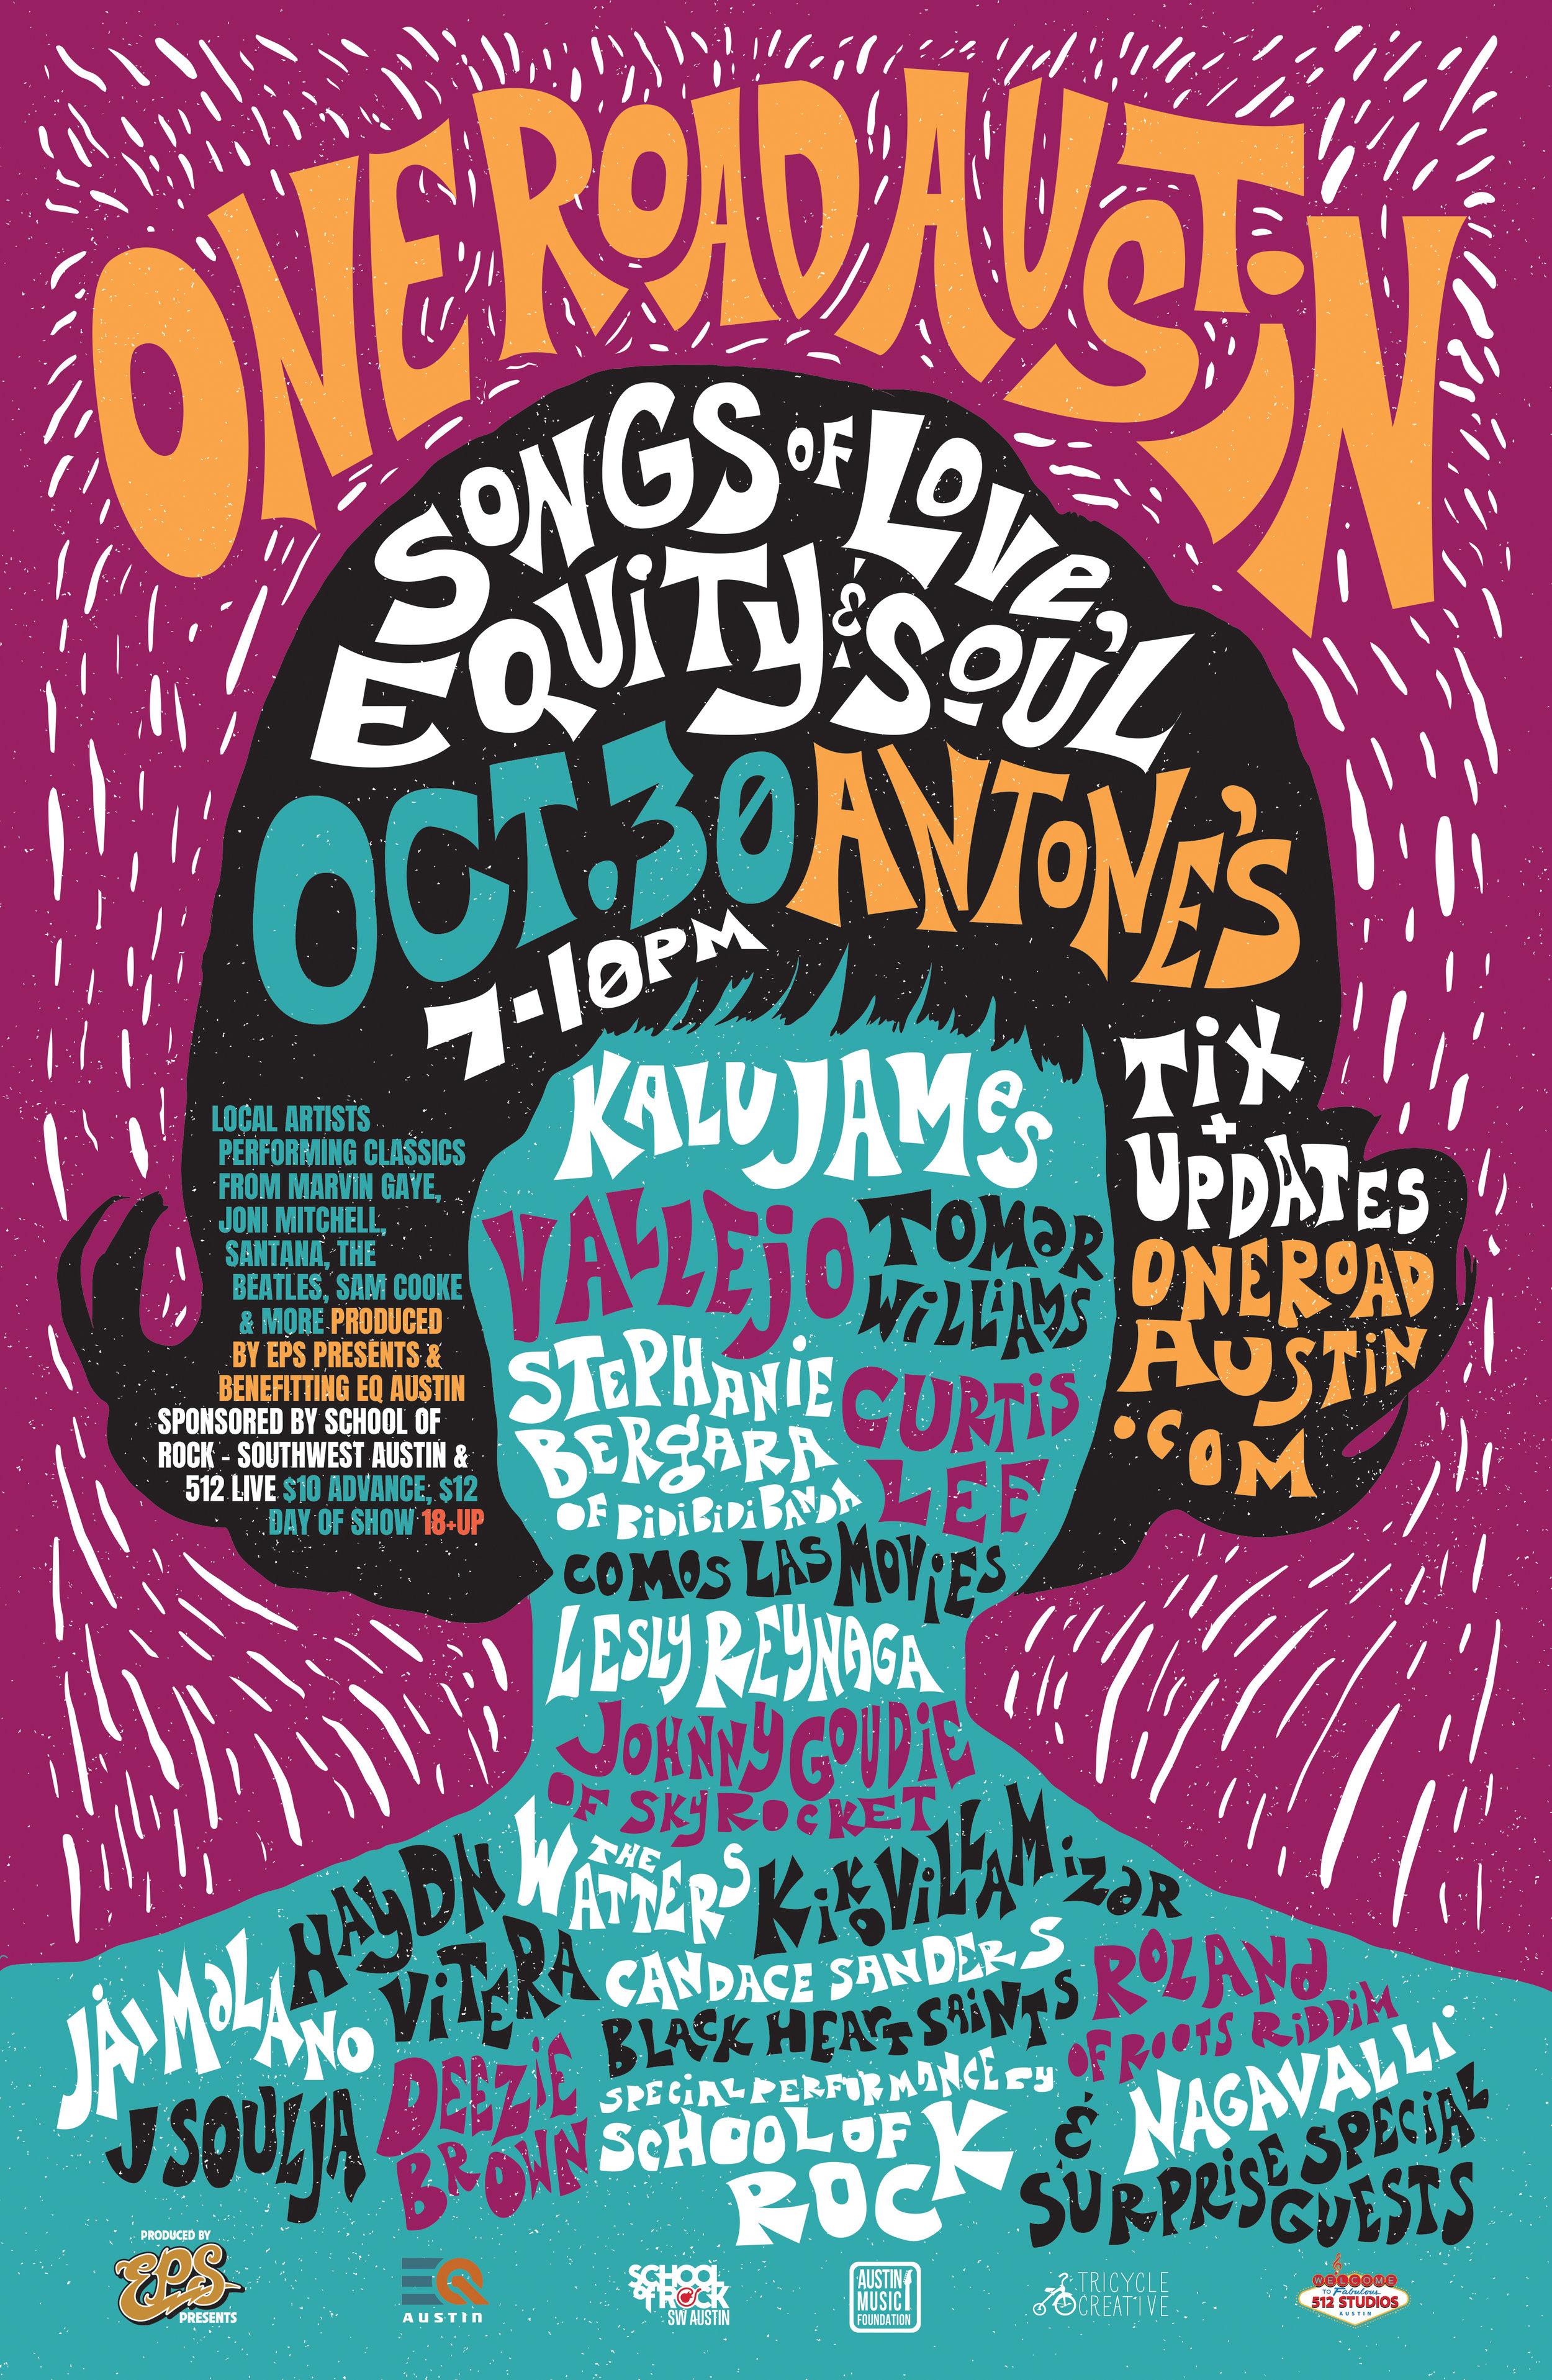 One Road Austin 2019 Poster.jpg